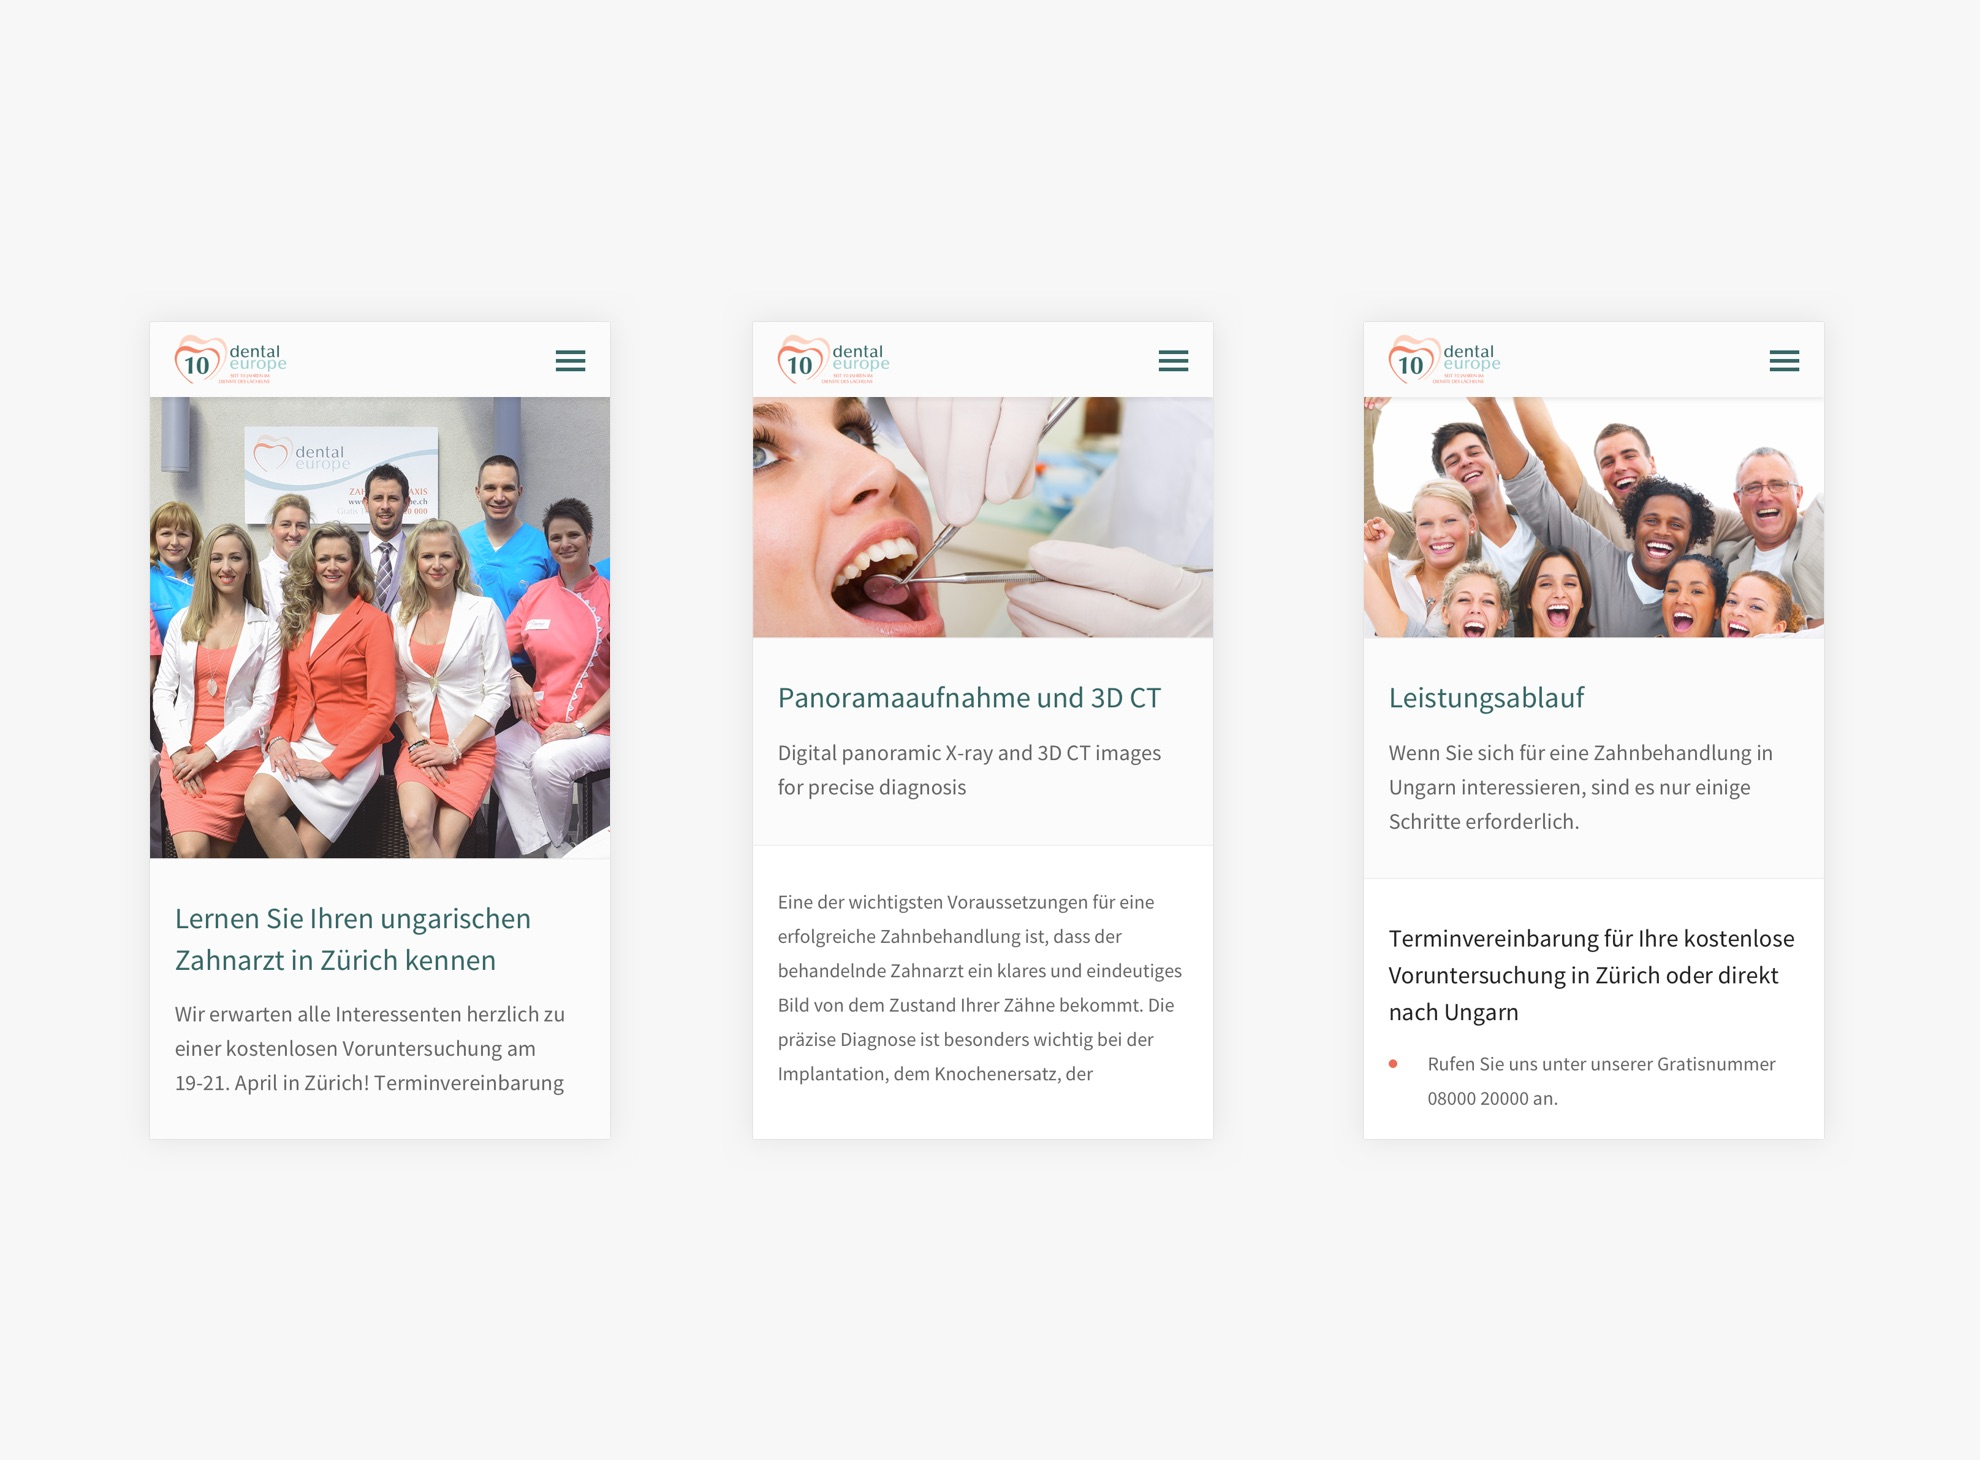 Zahnarzt in Ungarn - Reszponzív weboldal - Üzleti reszponzív weboldal készítés